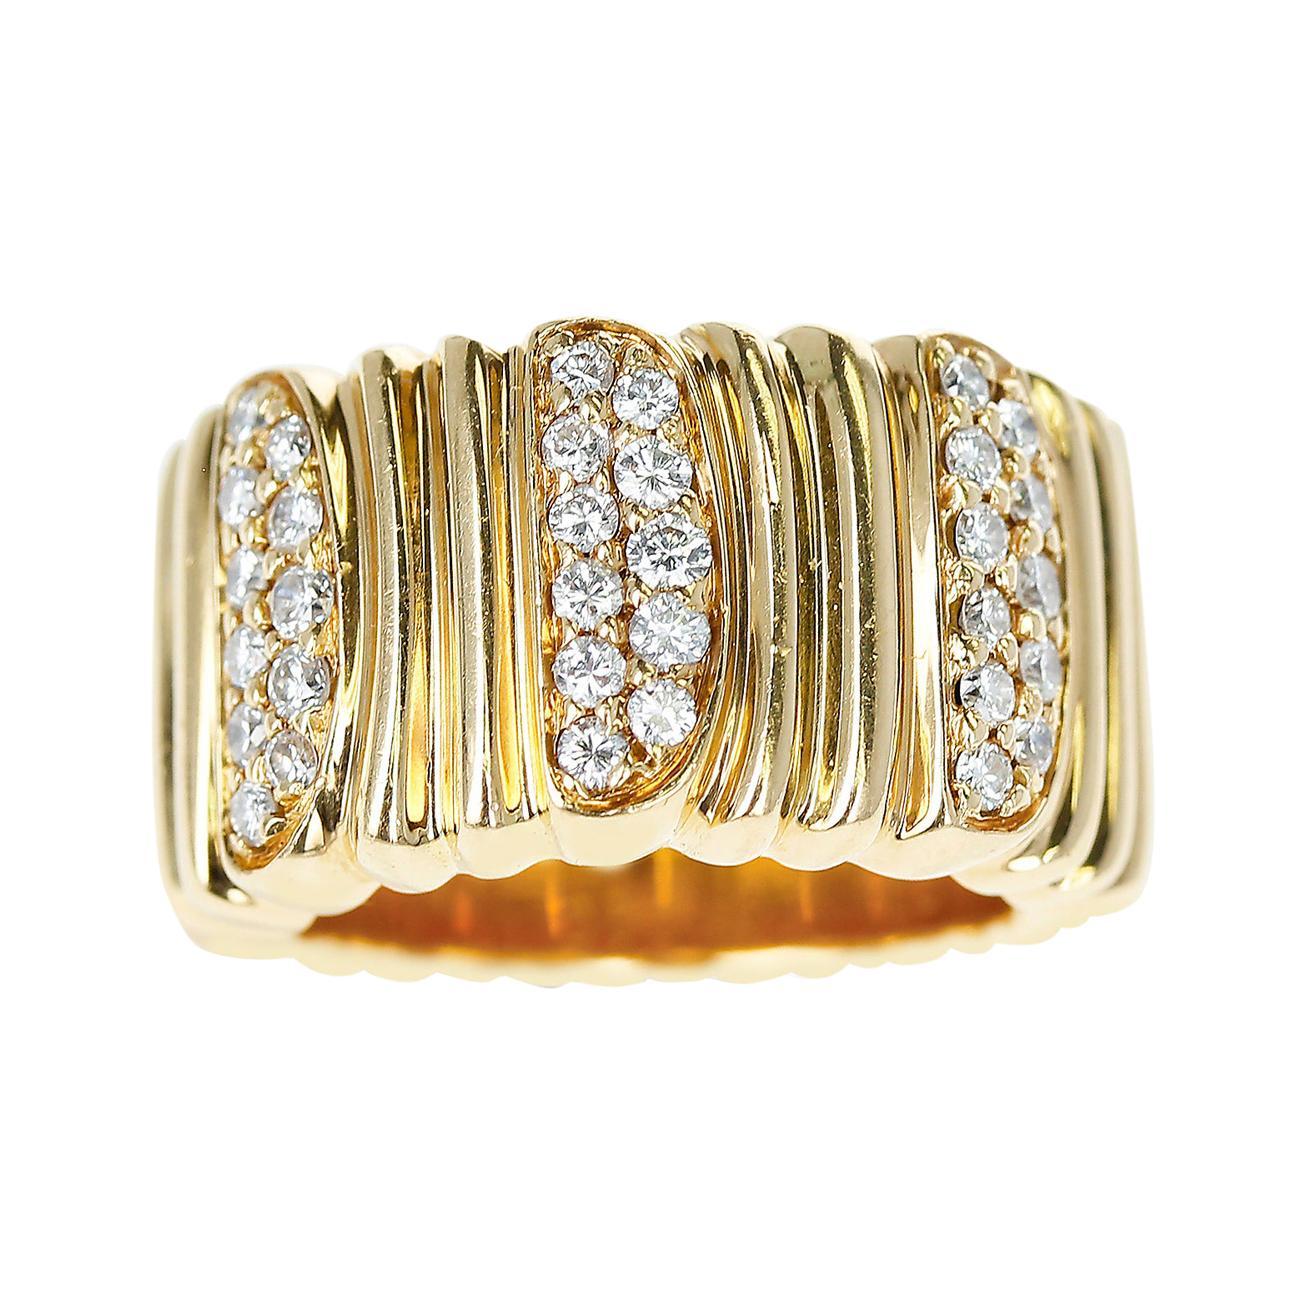 Cartier Textured 18 Karat Yellow Gold and Diamond Band Ring